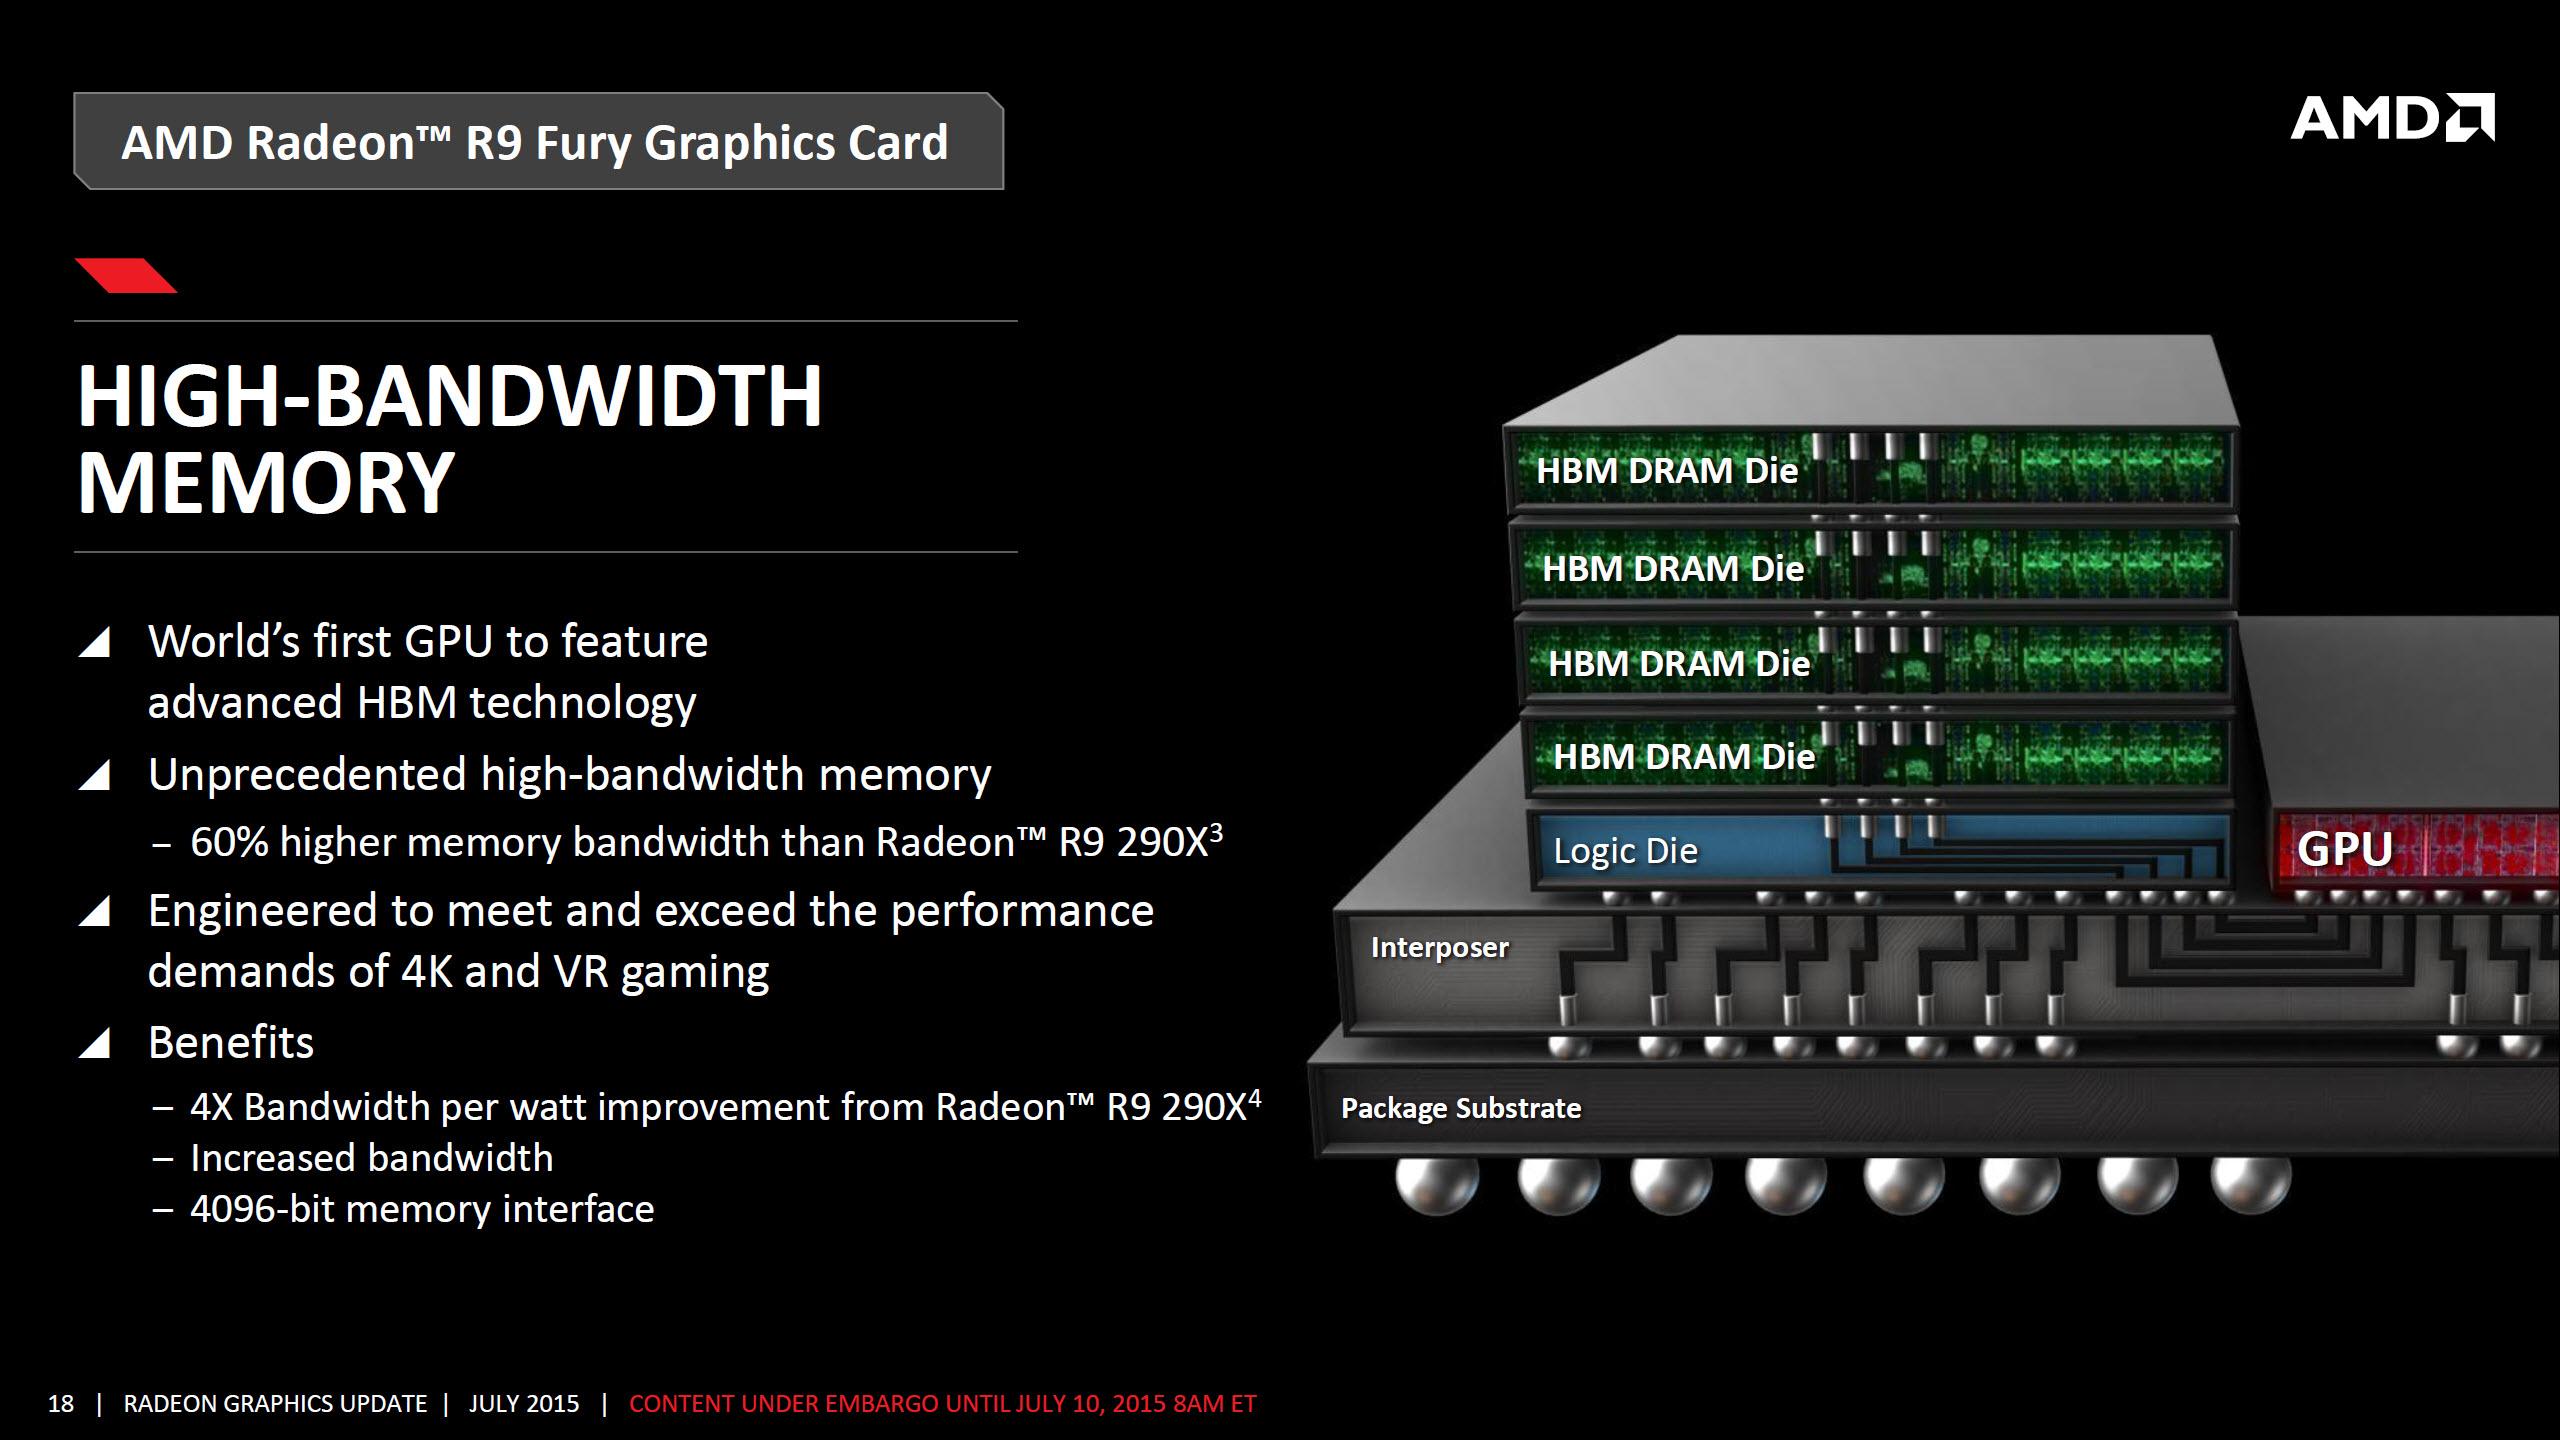 AMD Radeon R9 Fury Fiji HBM